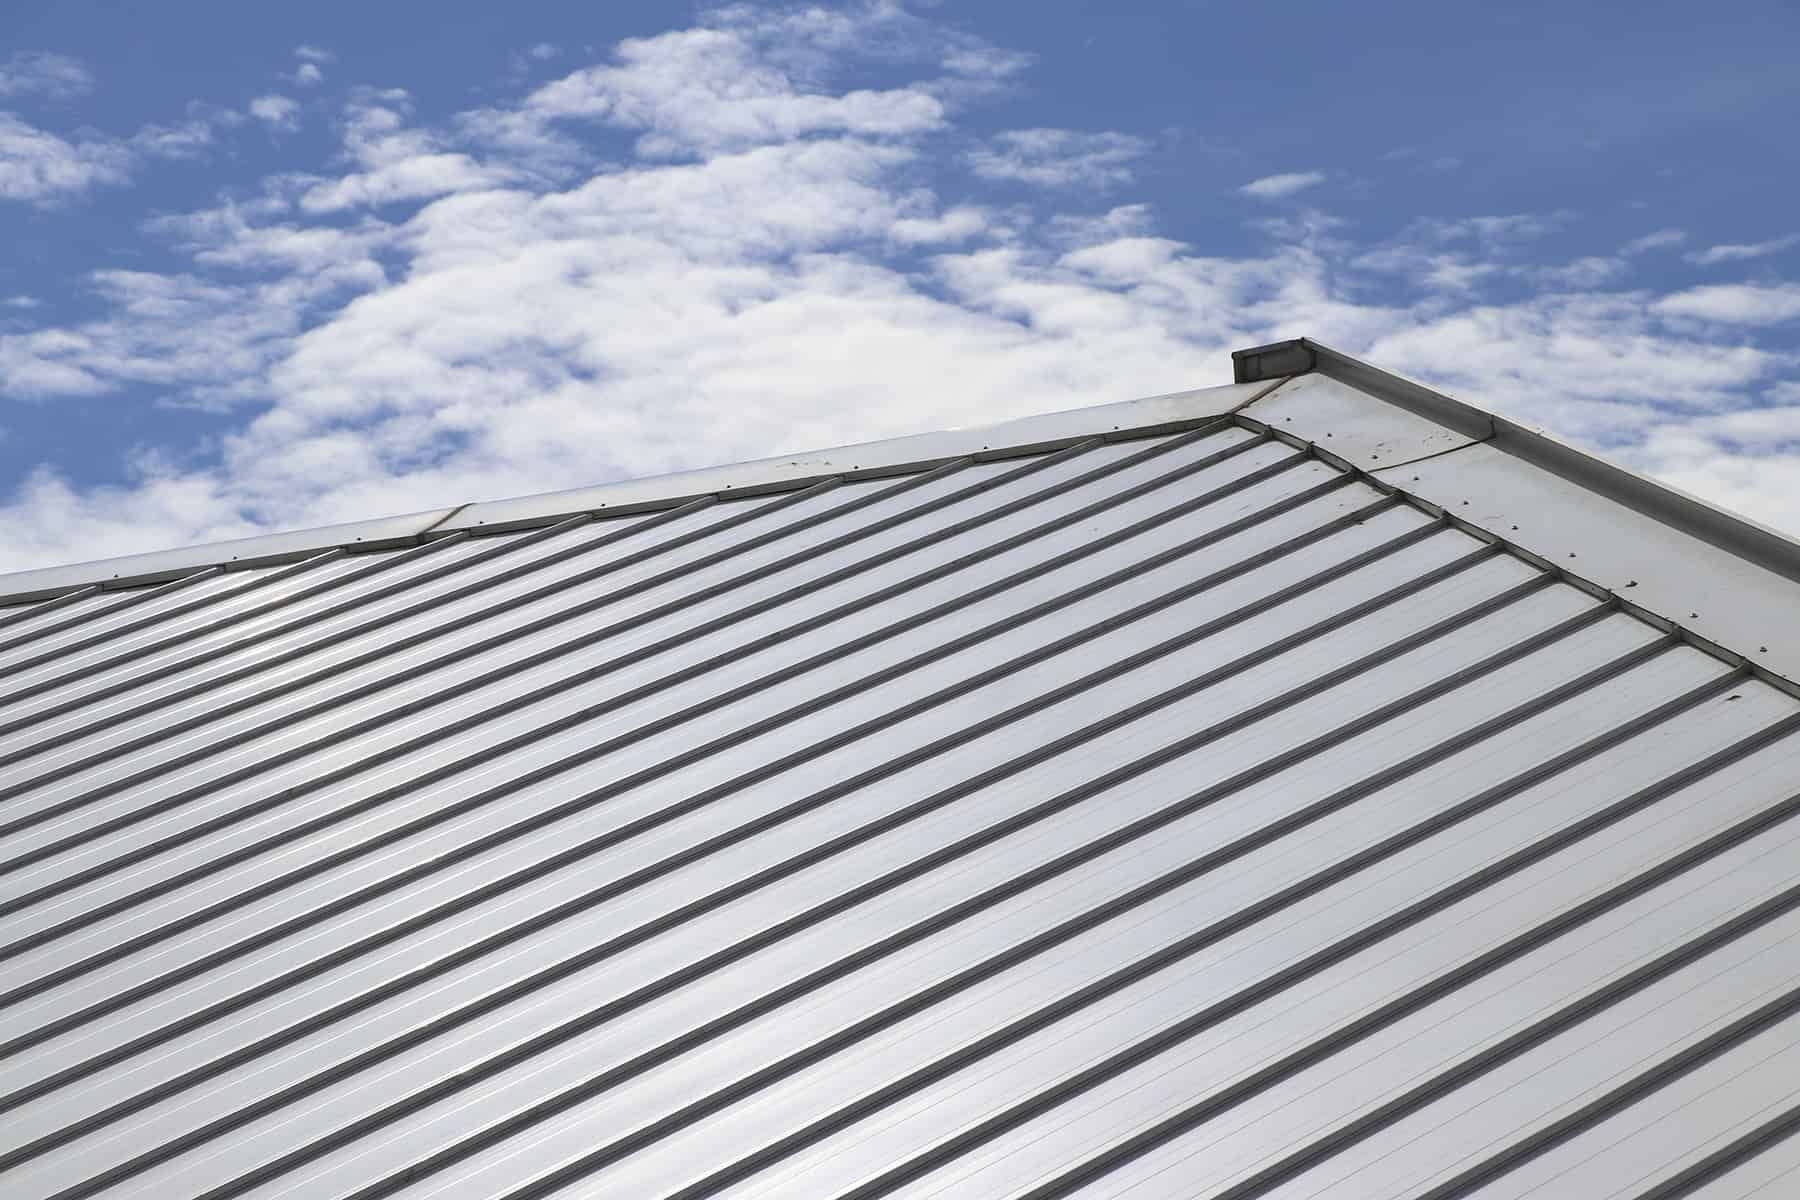 Metal Roofing Cost Per Foot In 2020 Metal Roof Cost Roof Cost Metal Roof